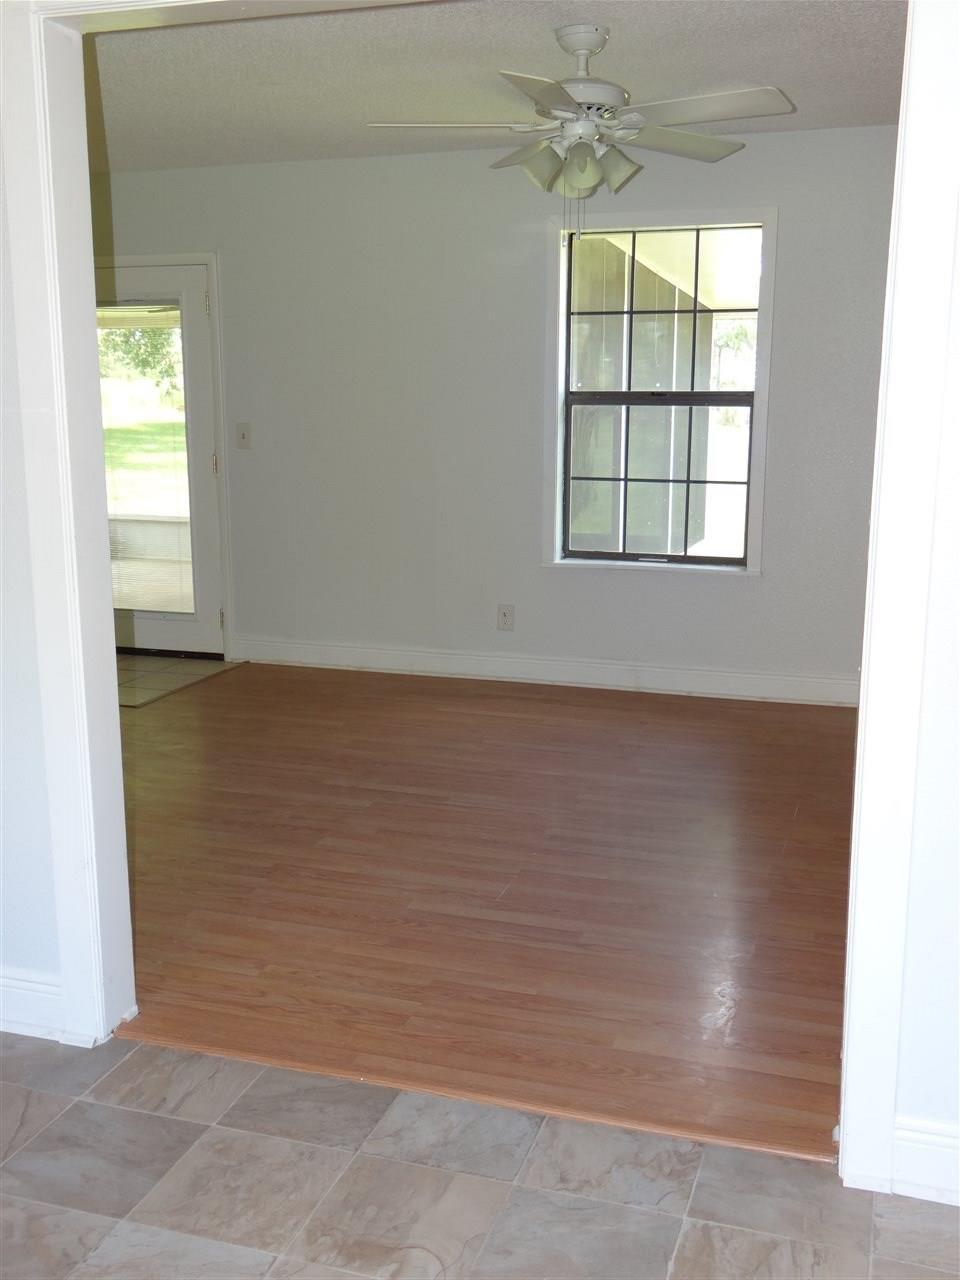 2950 Purdue Rd, Mcdavid, FL 32568